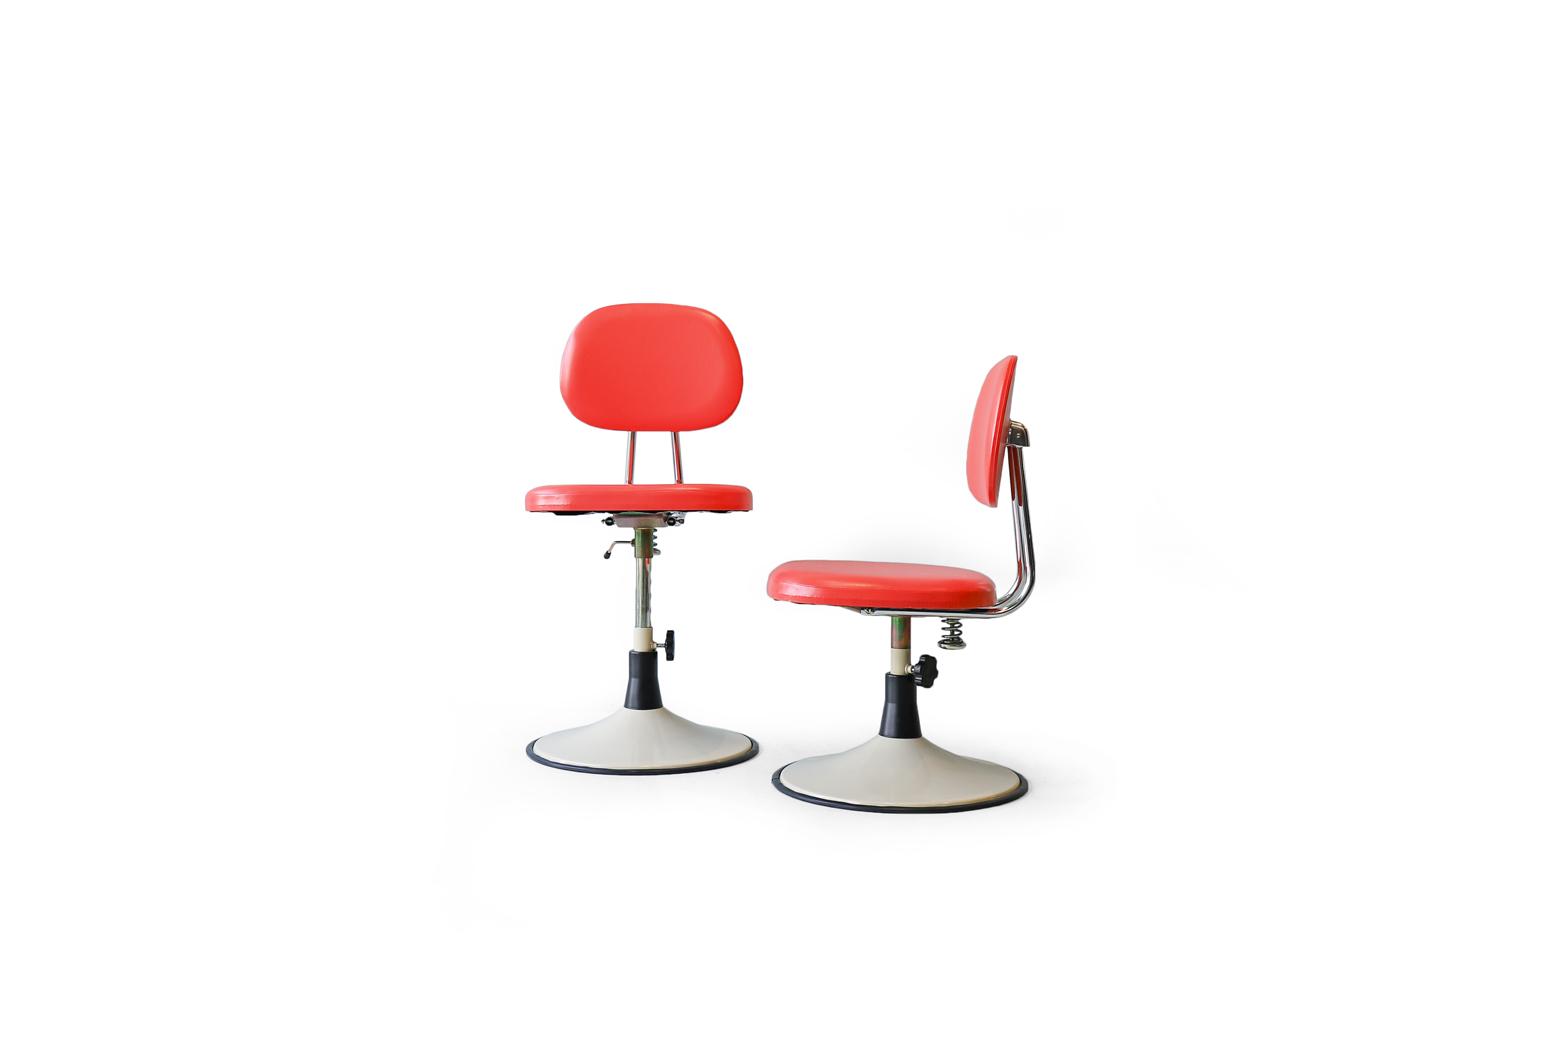 Japanese Vintage Desk Chair/ジャパンヴィンテージ デスクチェア 学習椅子 子供椅子 昭和レトロ モダン